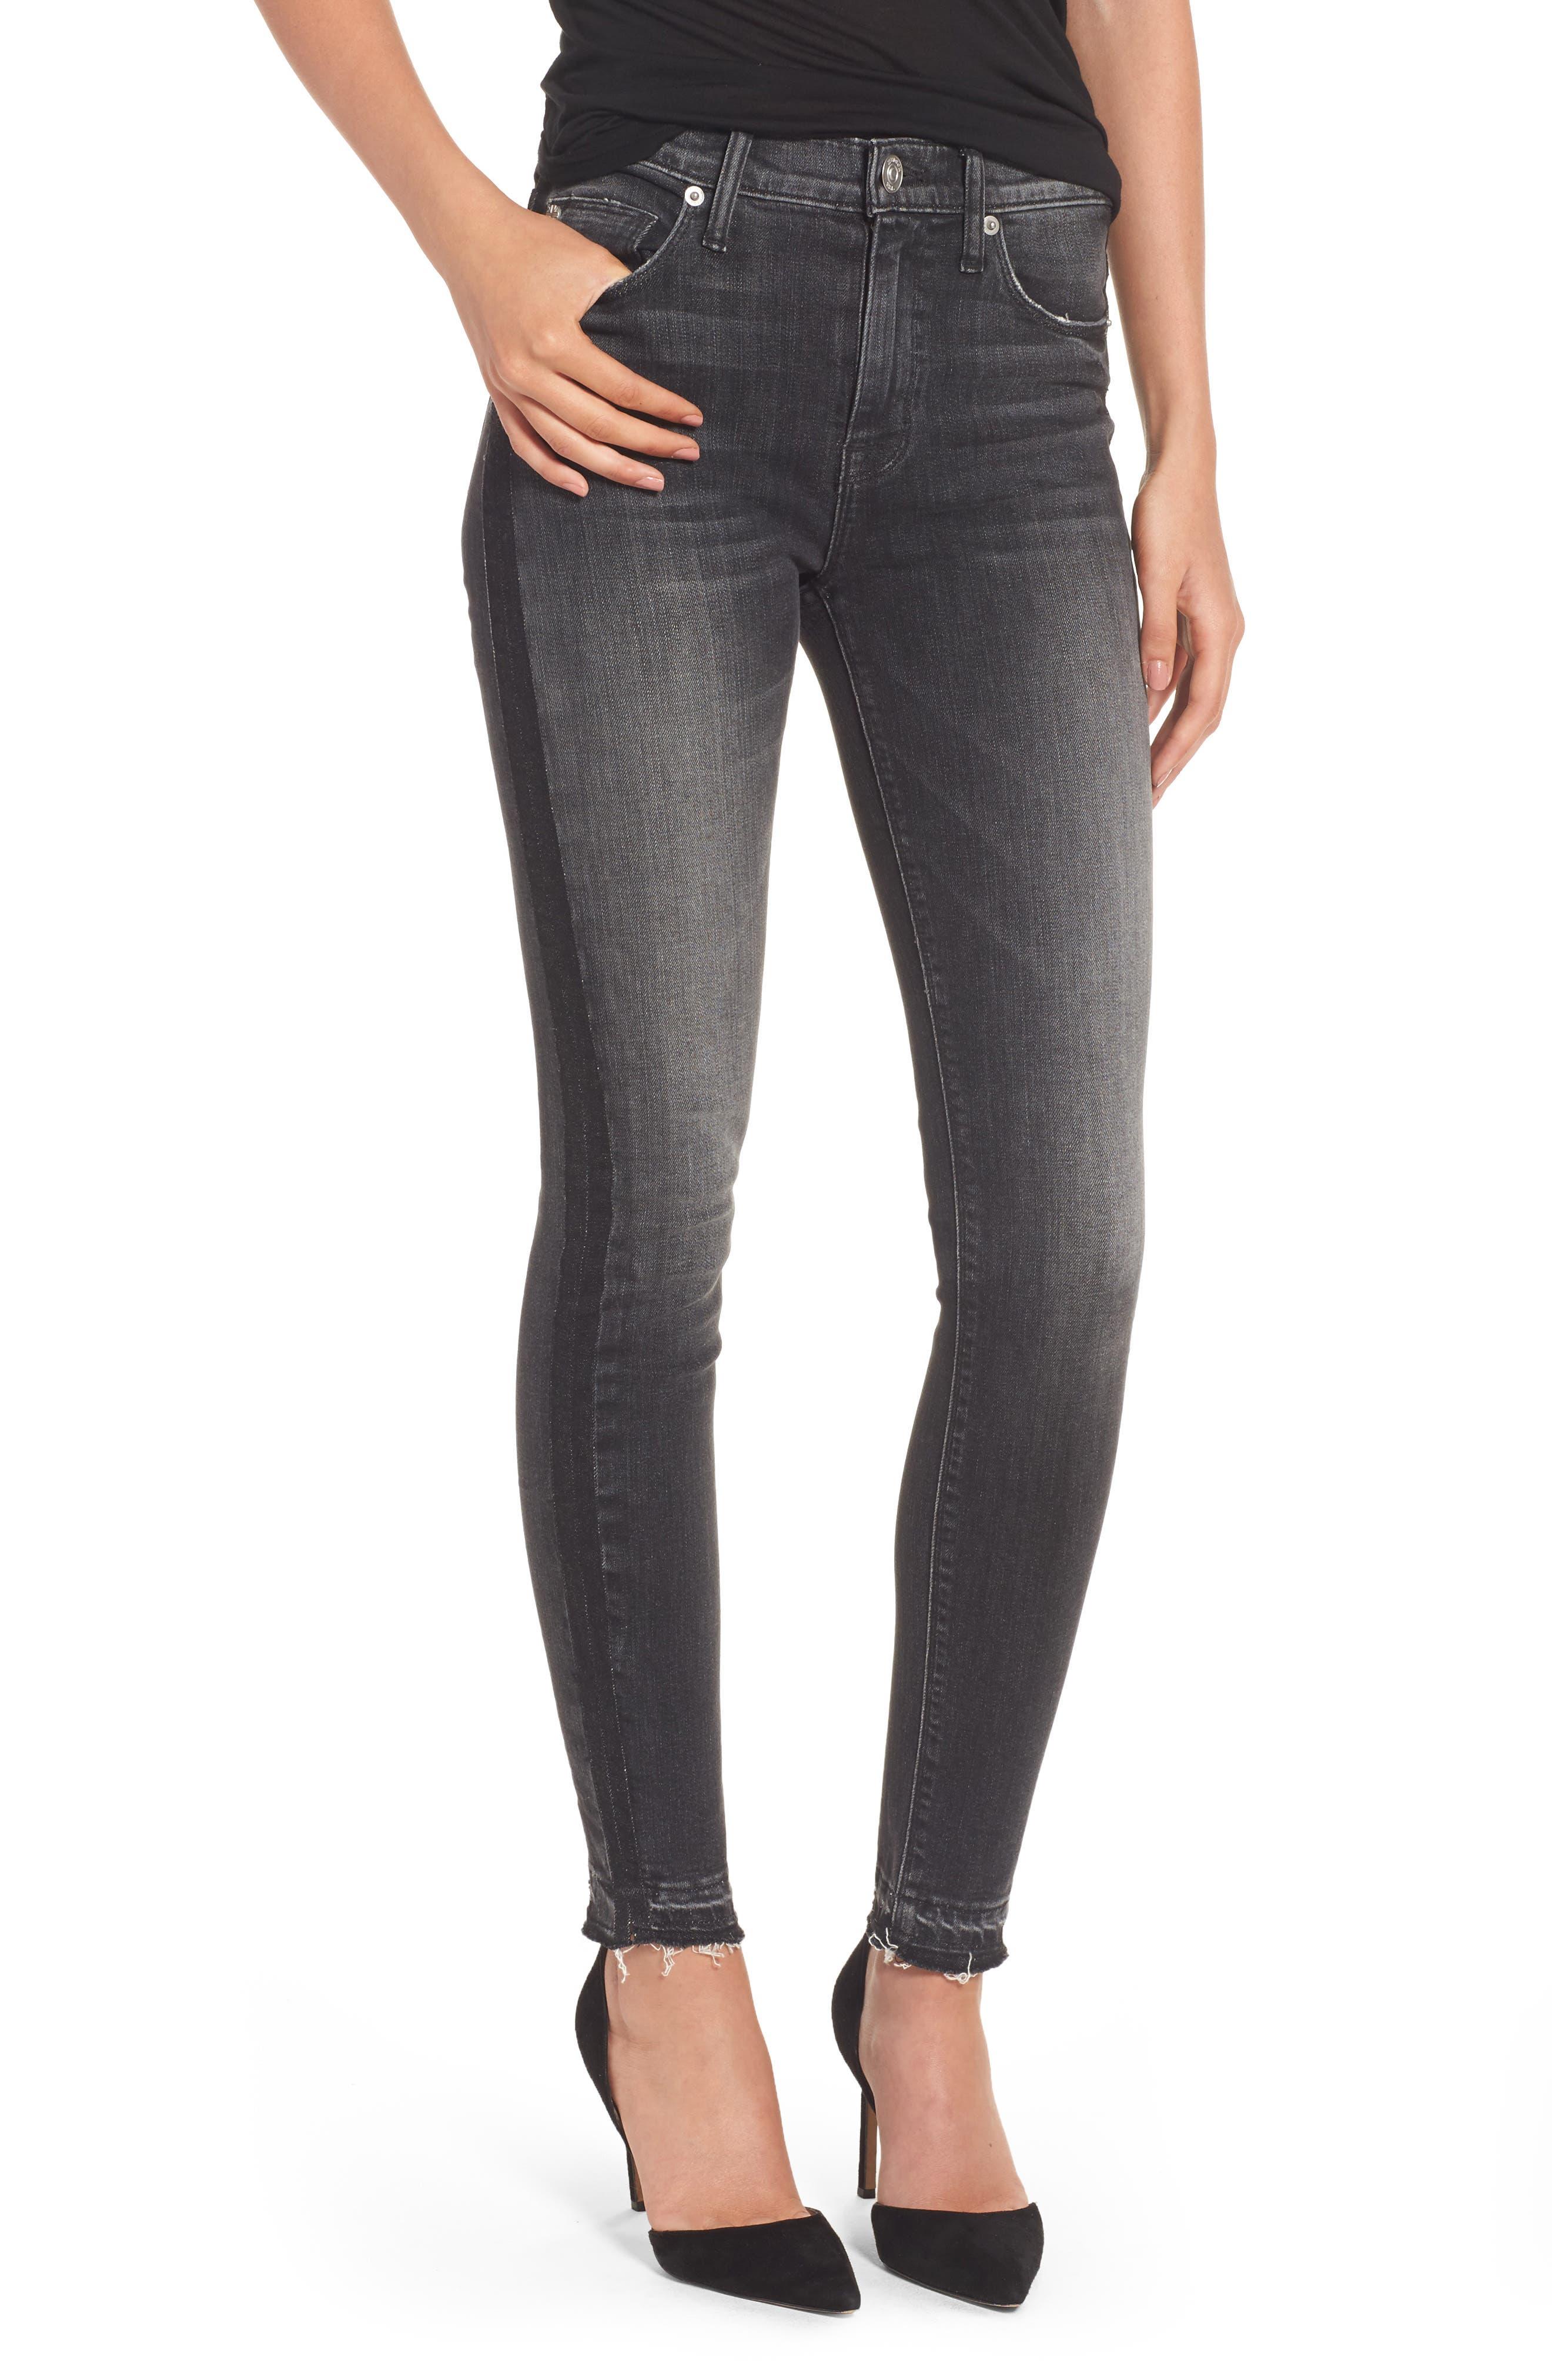 Main Image - Hudson Jeans Barbara High Waist Super Skinny Jeans (Onix)